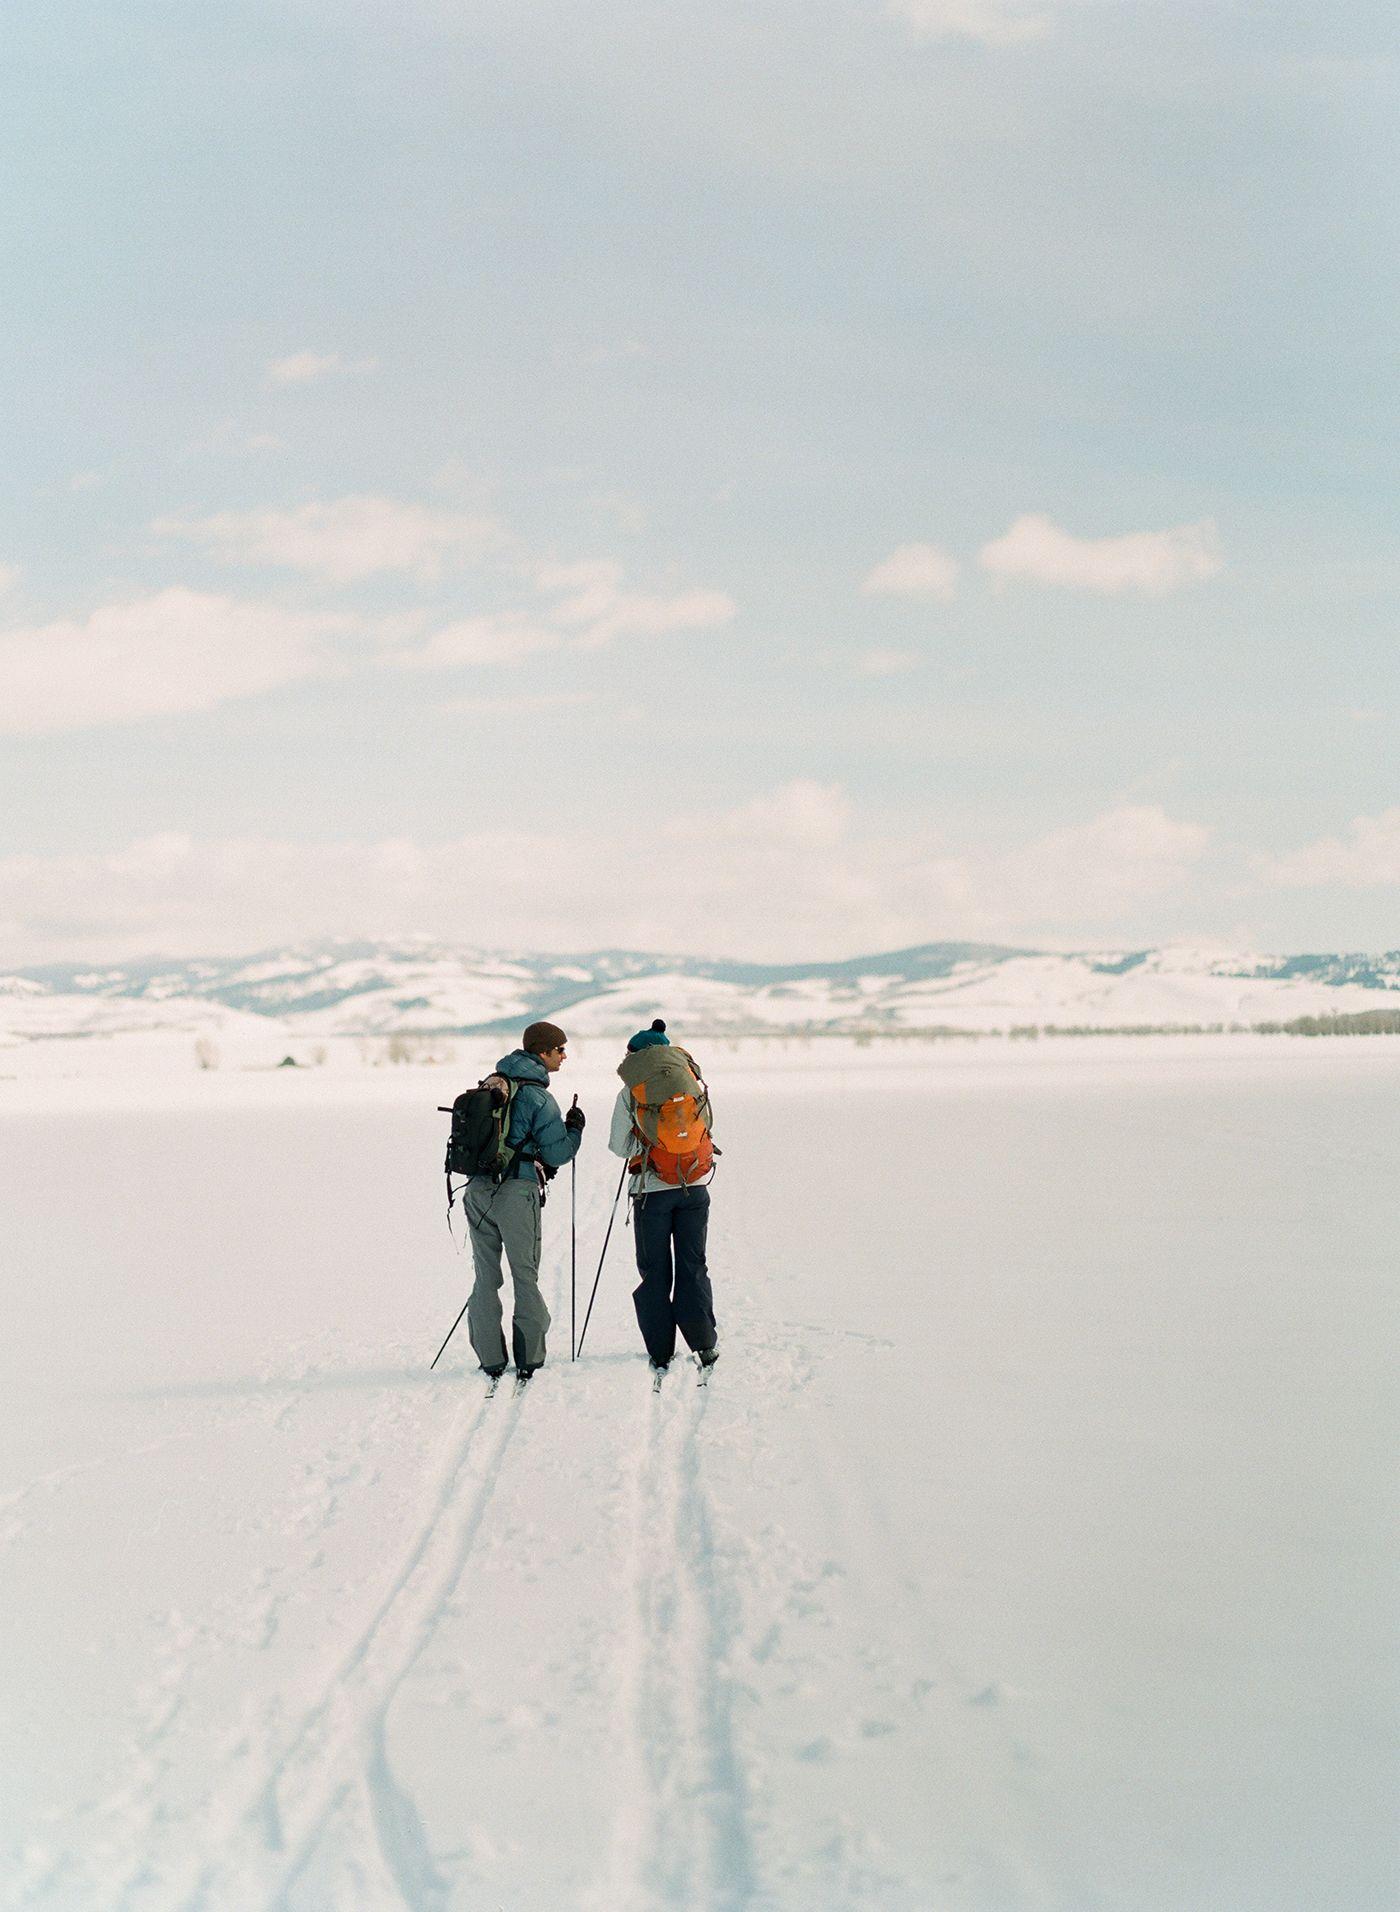 Jackson Hole, WY. Cross country skiing. Teton Mountains. http://lesleemitchell.com/blog/2011/09/26/jackson-hole-wy-3/